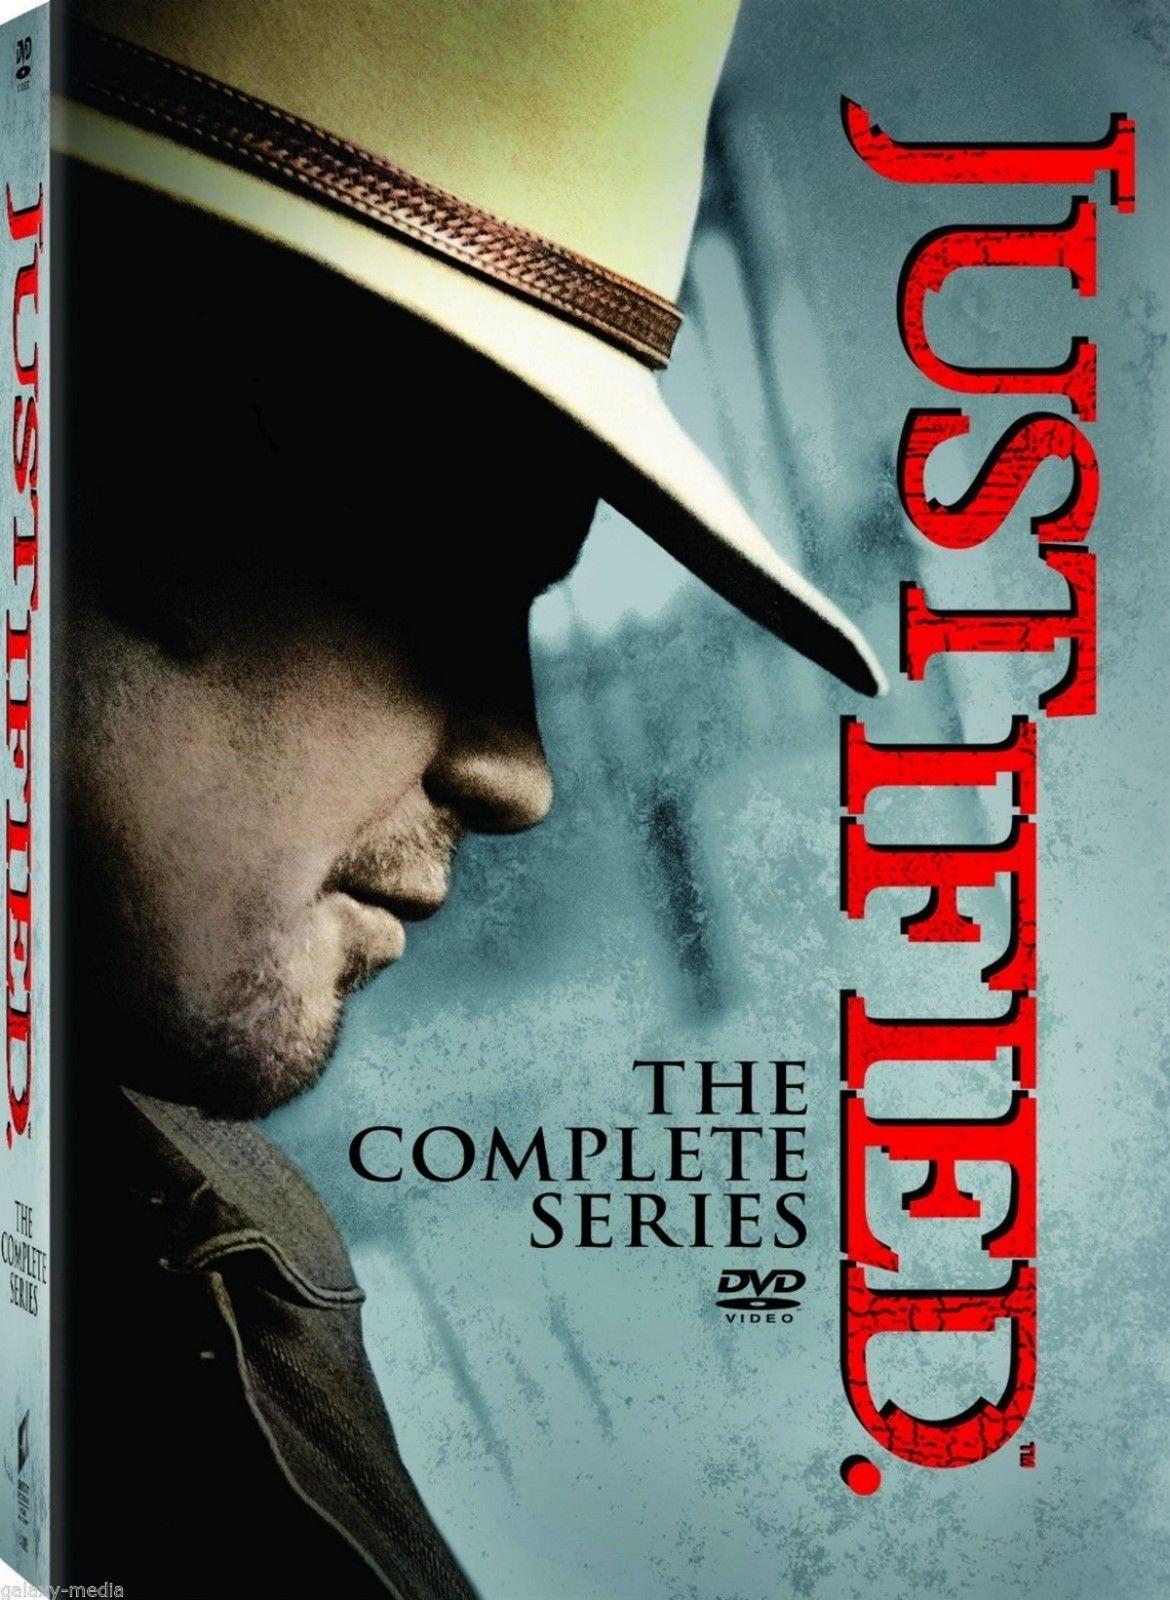 Justified complete series dvd